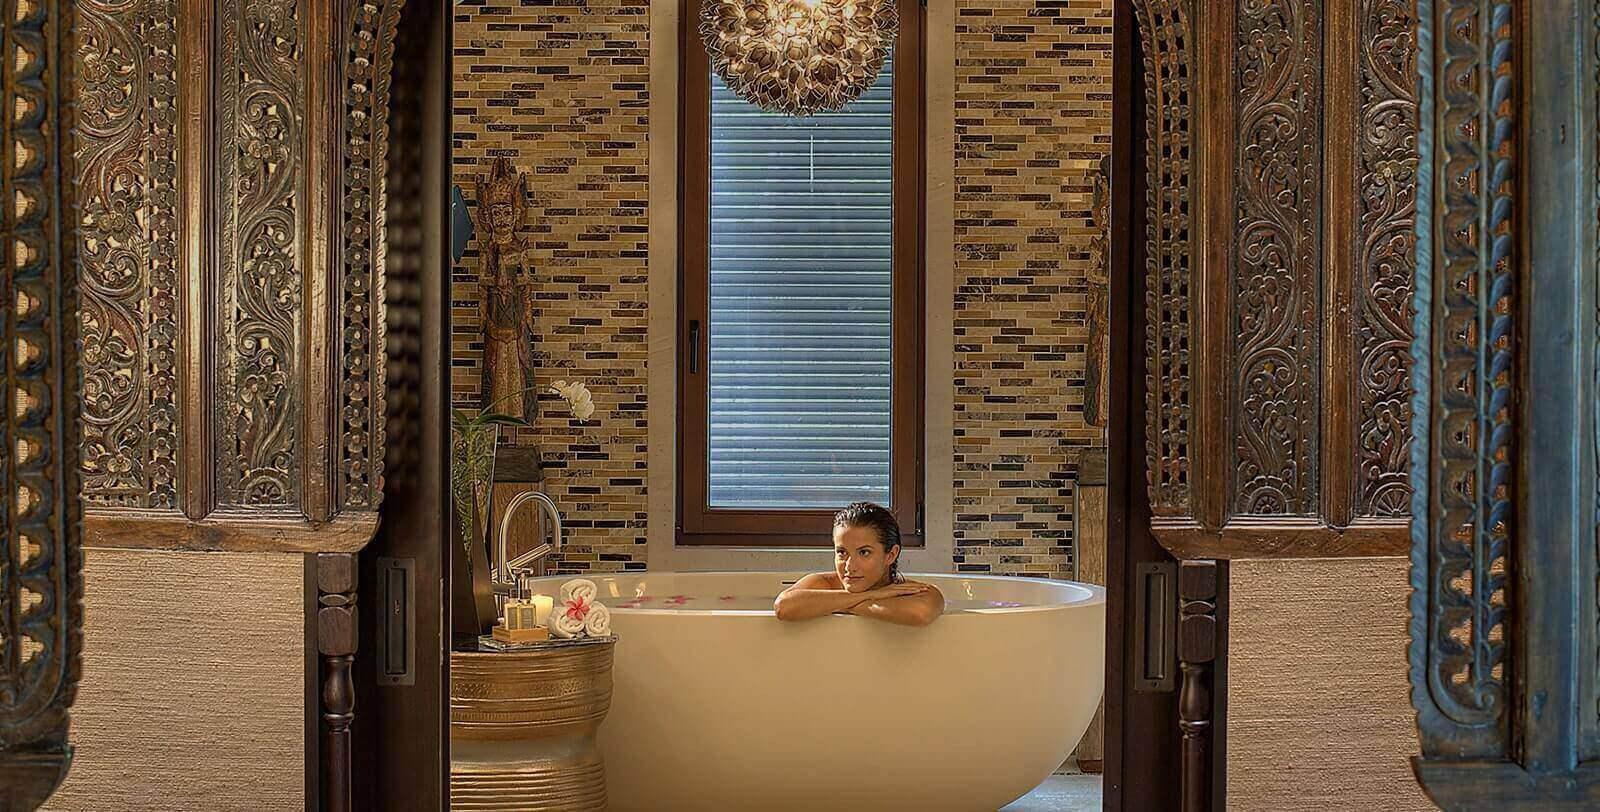 Romania Bathtubs